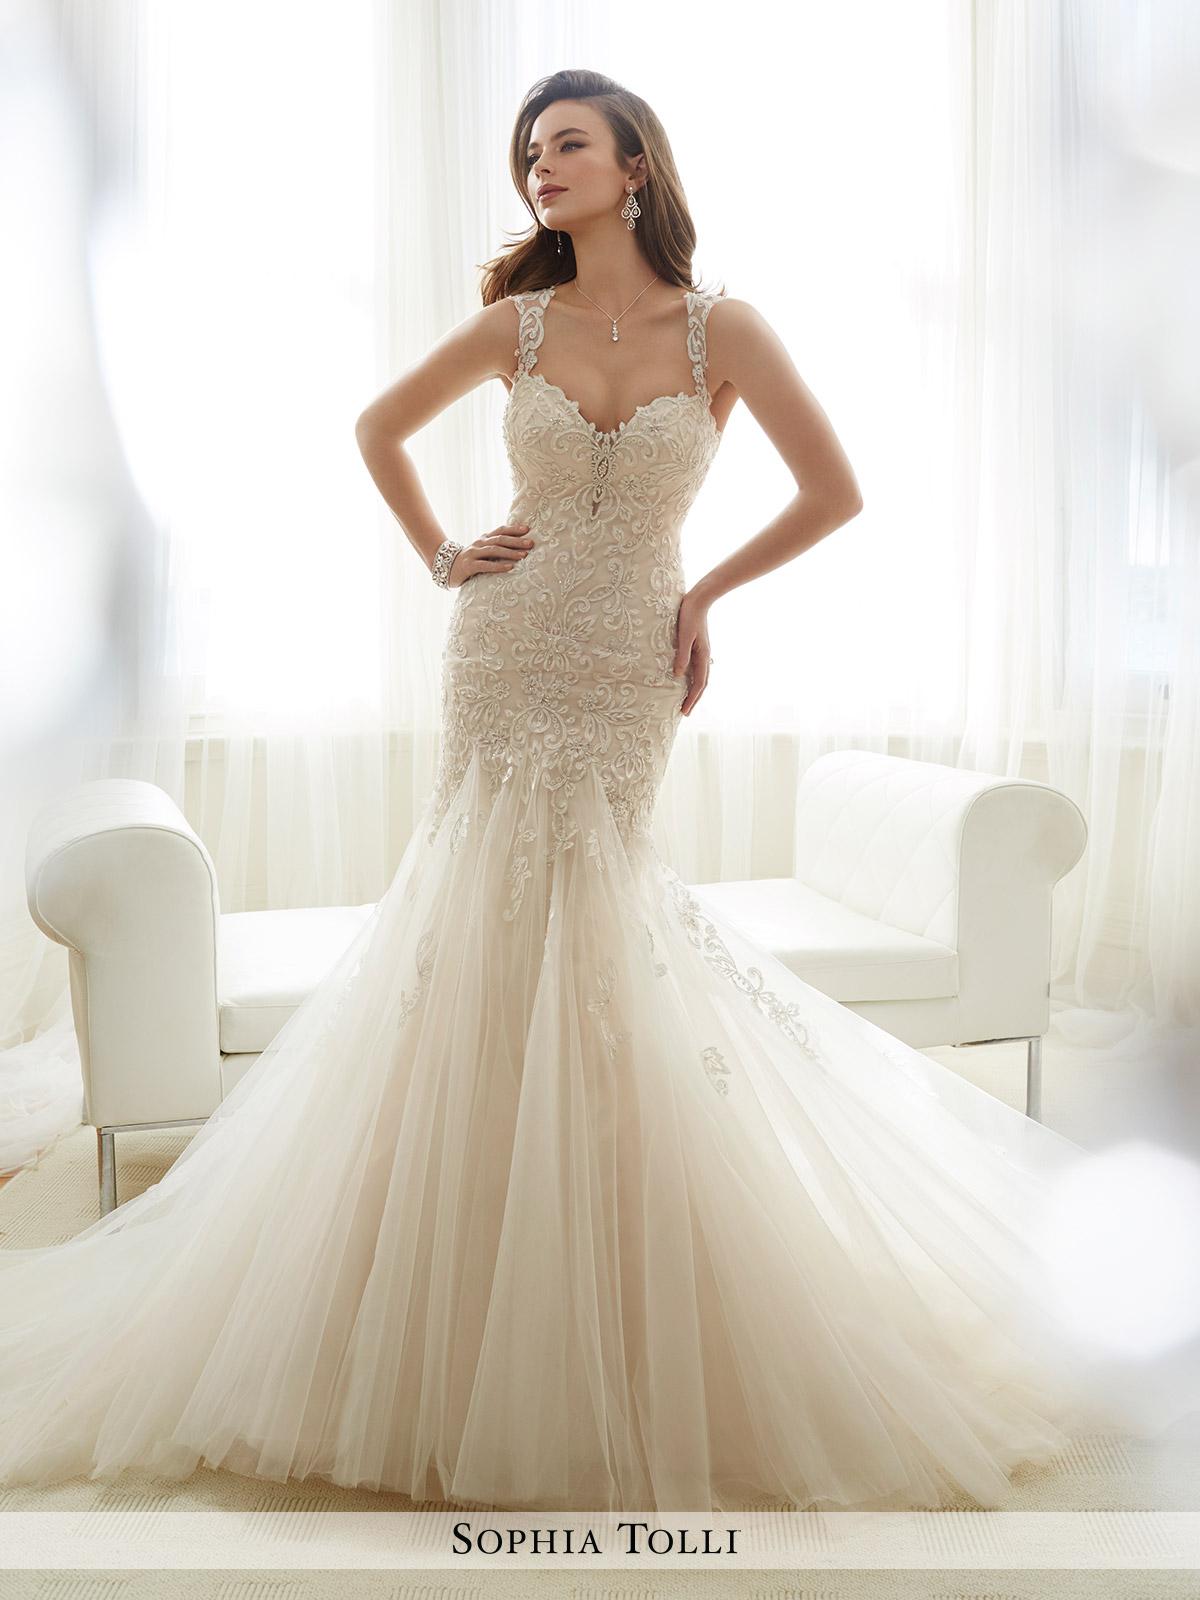 Dress Sophia Tolli Spring 2017 Collection Y11722 Amie